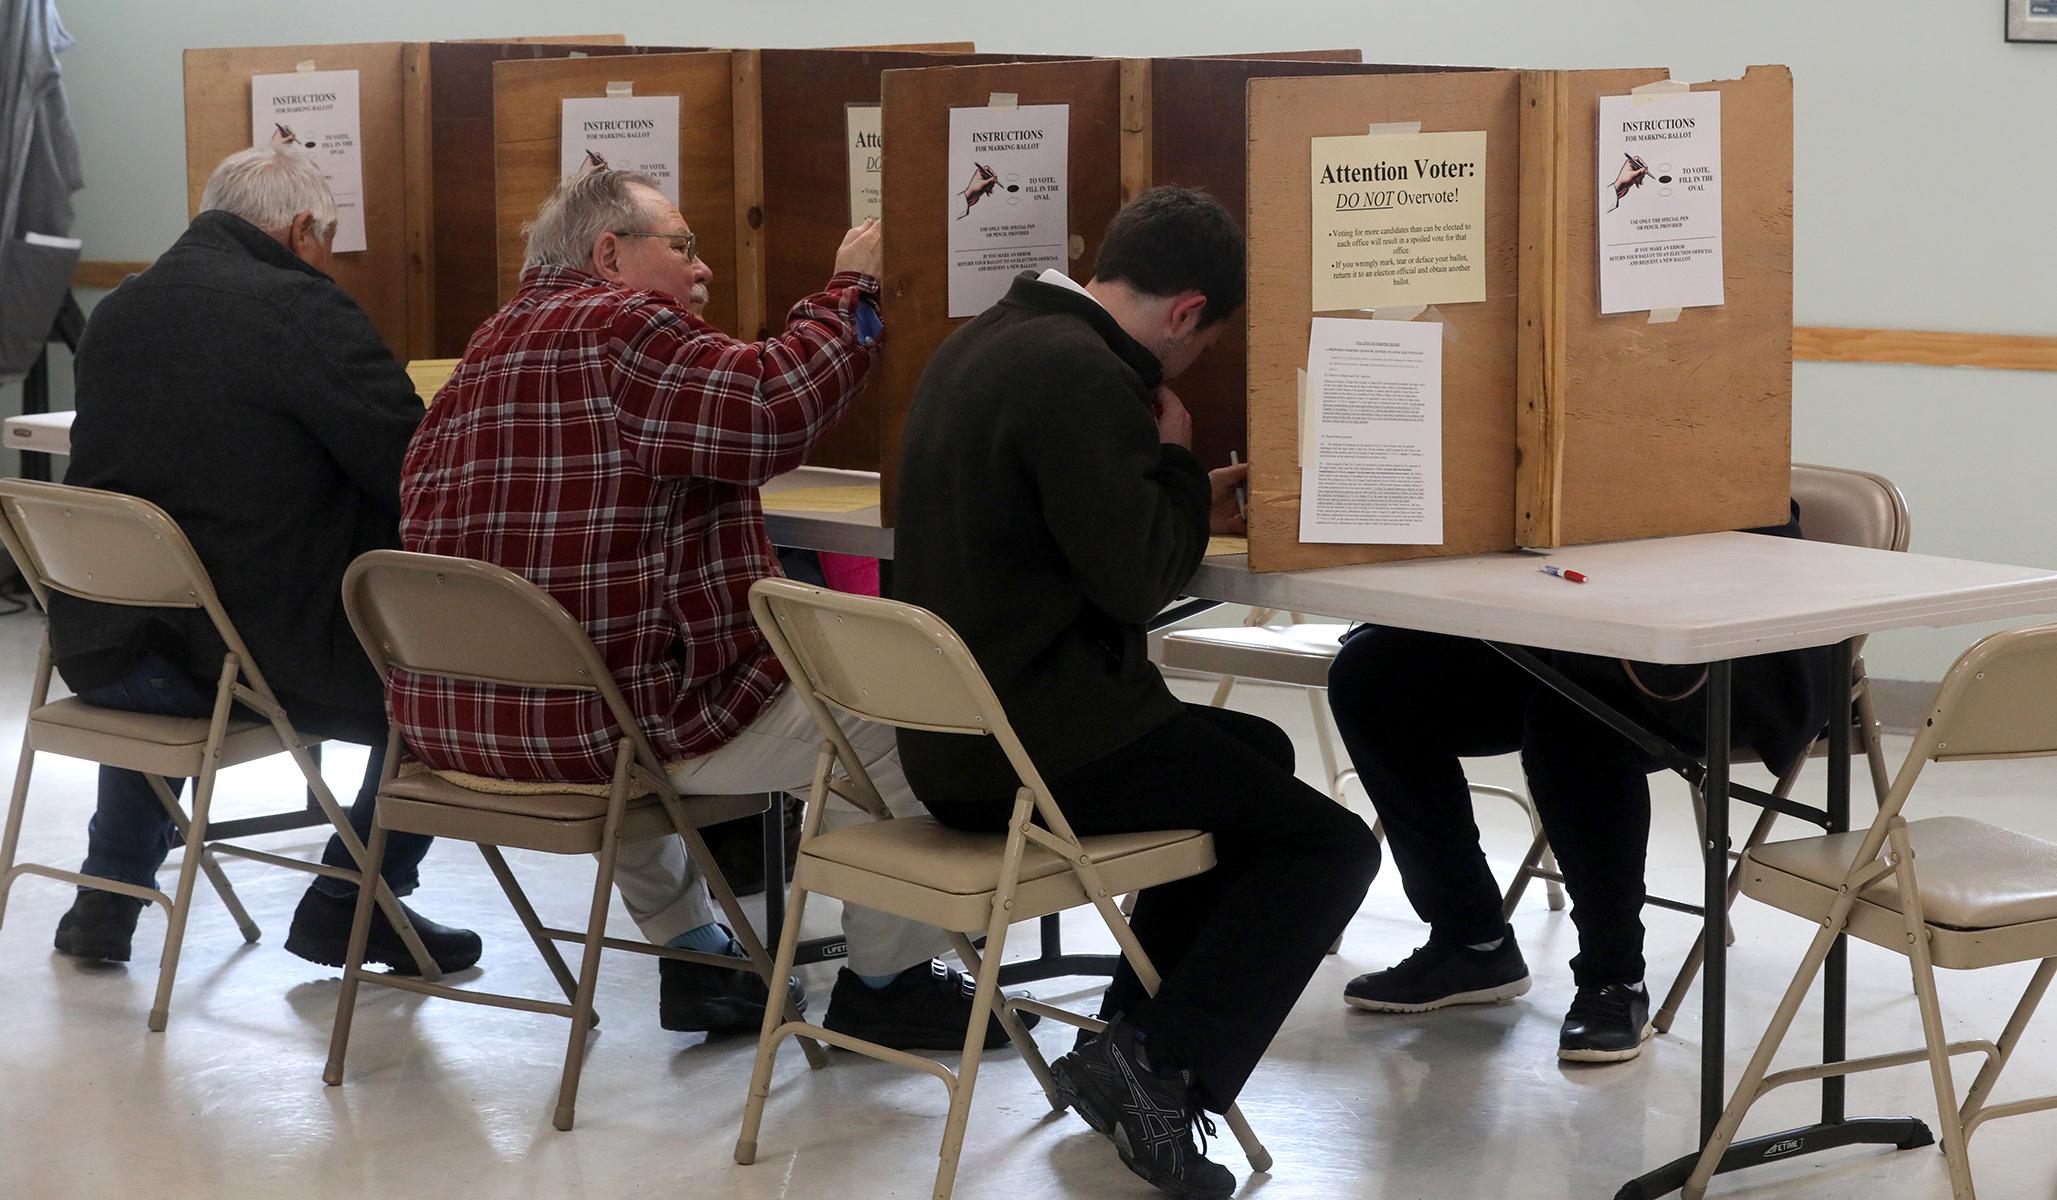 Pemilihan Kota: RNC Menuntut Kota Vermont yang Mengizinkan Bukan Warga Negara untuk Memilih